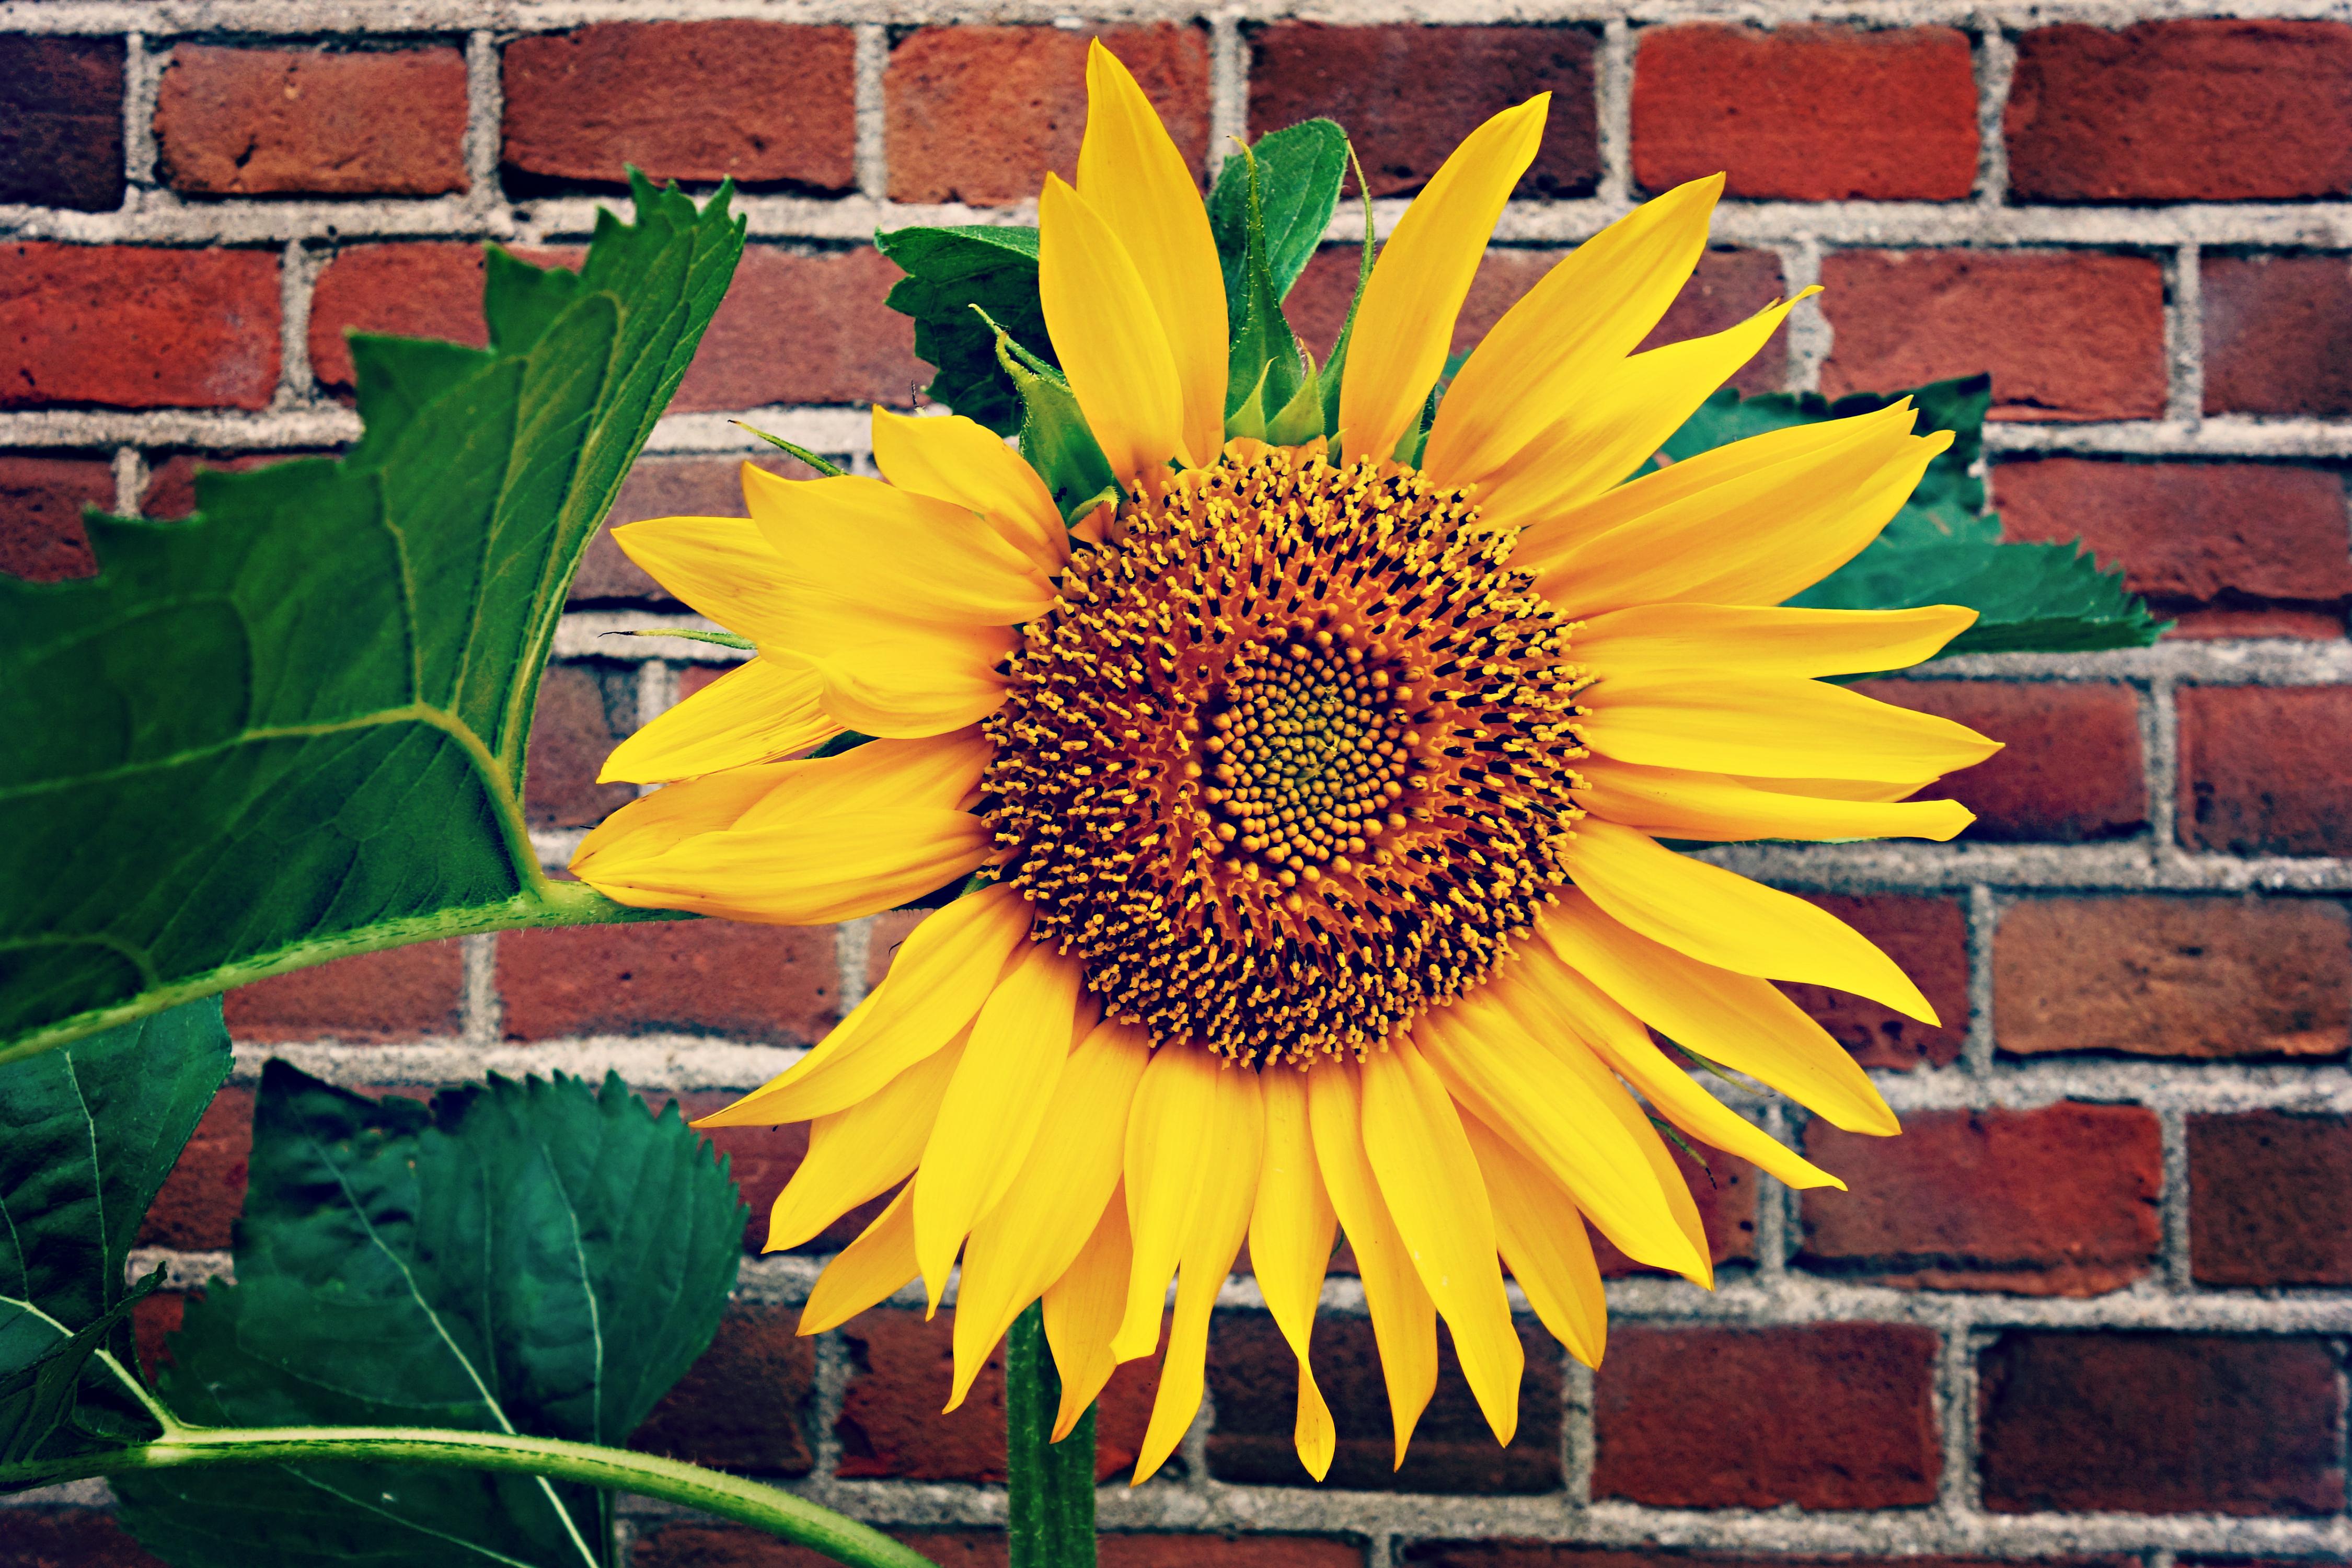 Make a sunflower candle holder